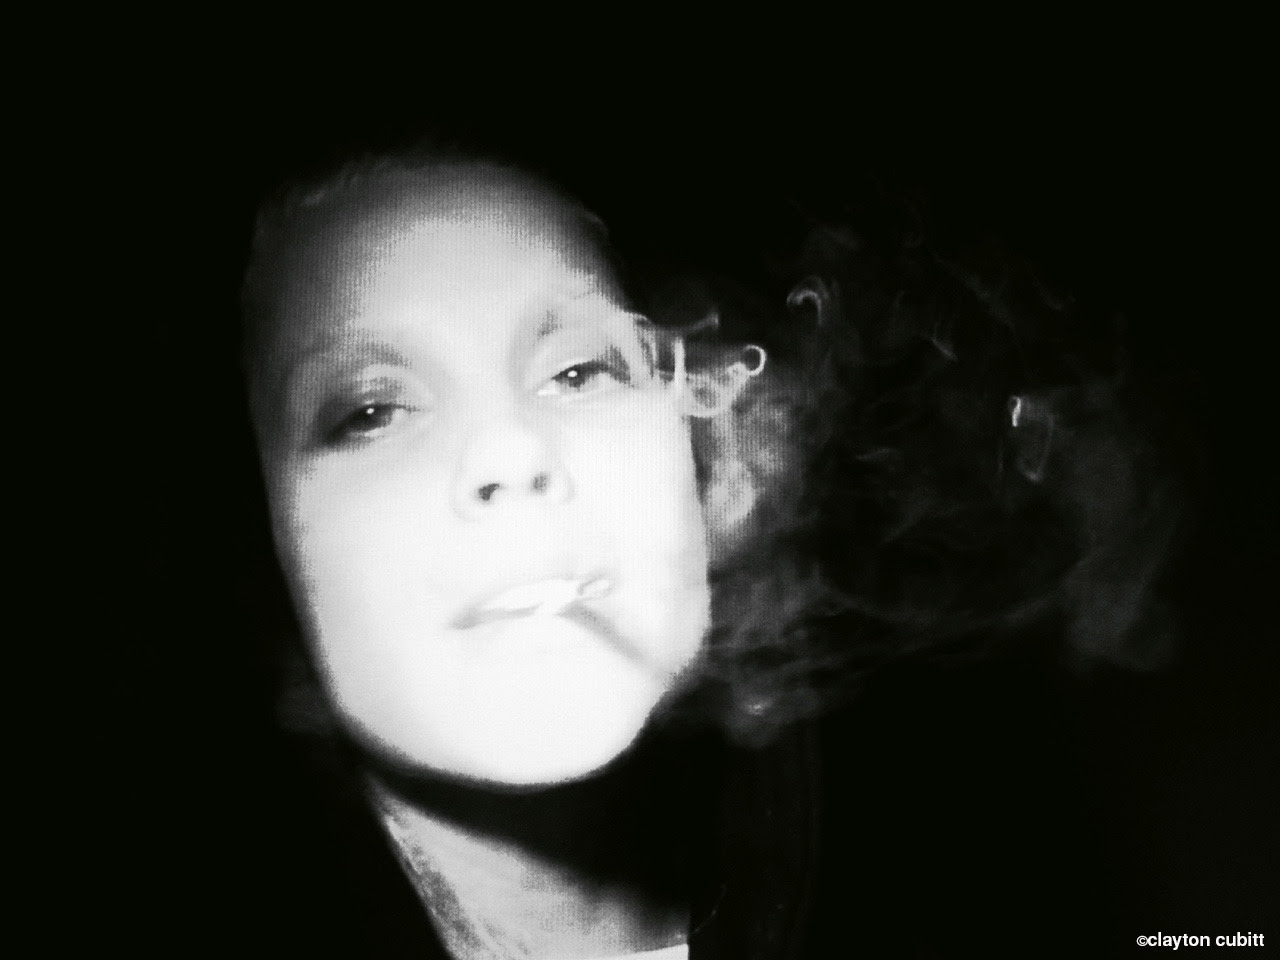 Yolandi smoking (video still)